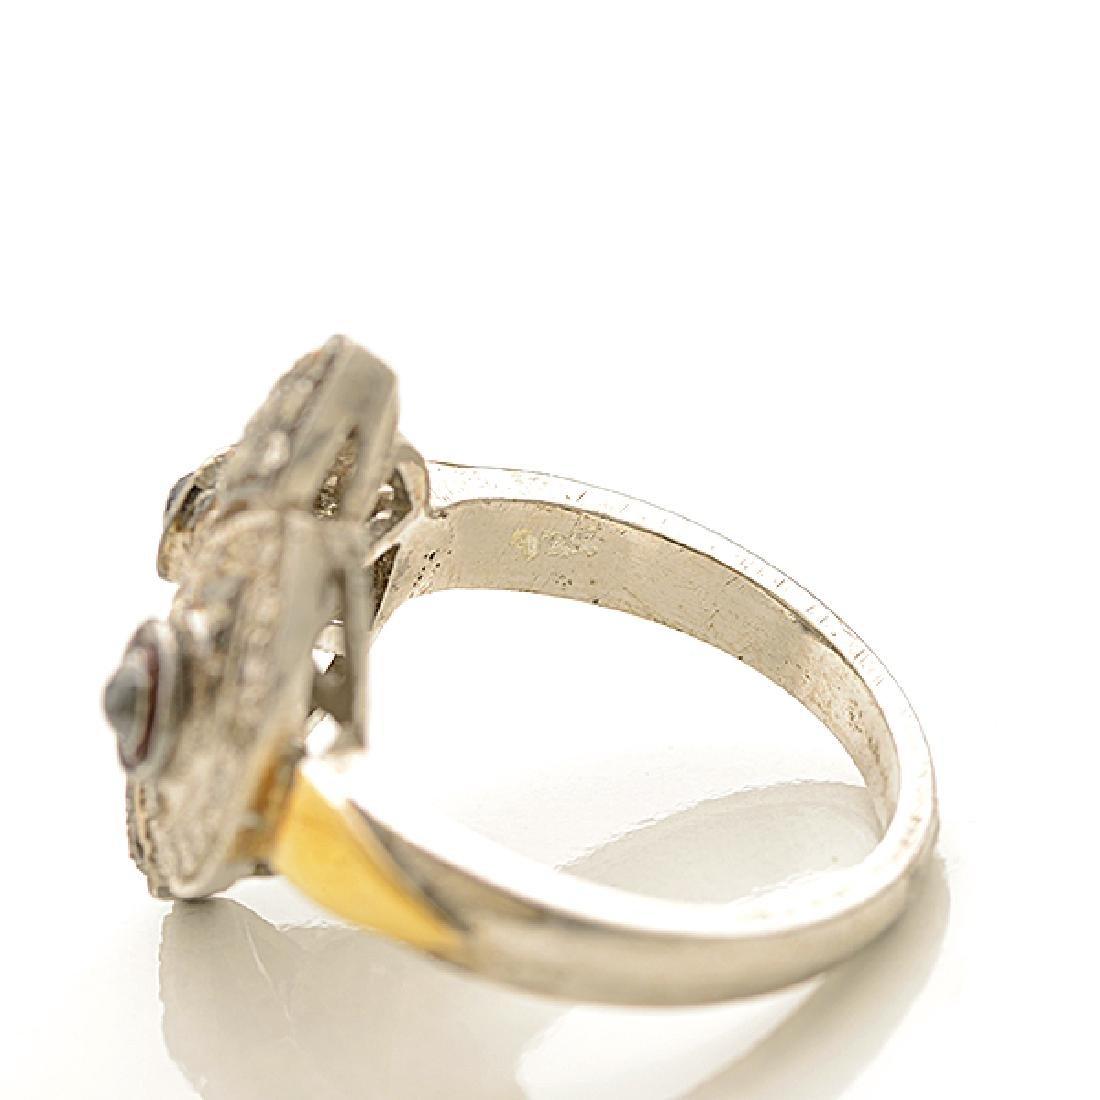 Diamond, Silver, 14k Yellow Gold Ring. - 4